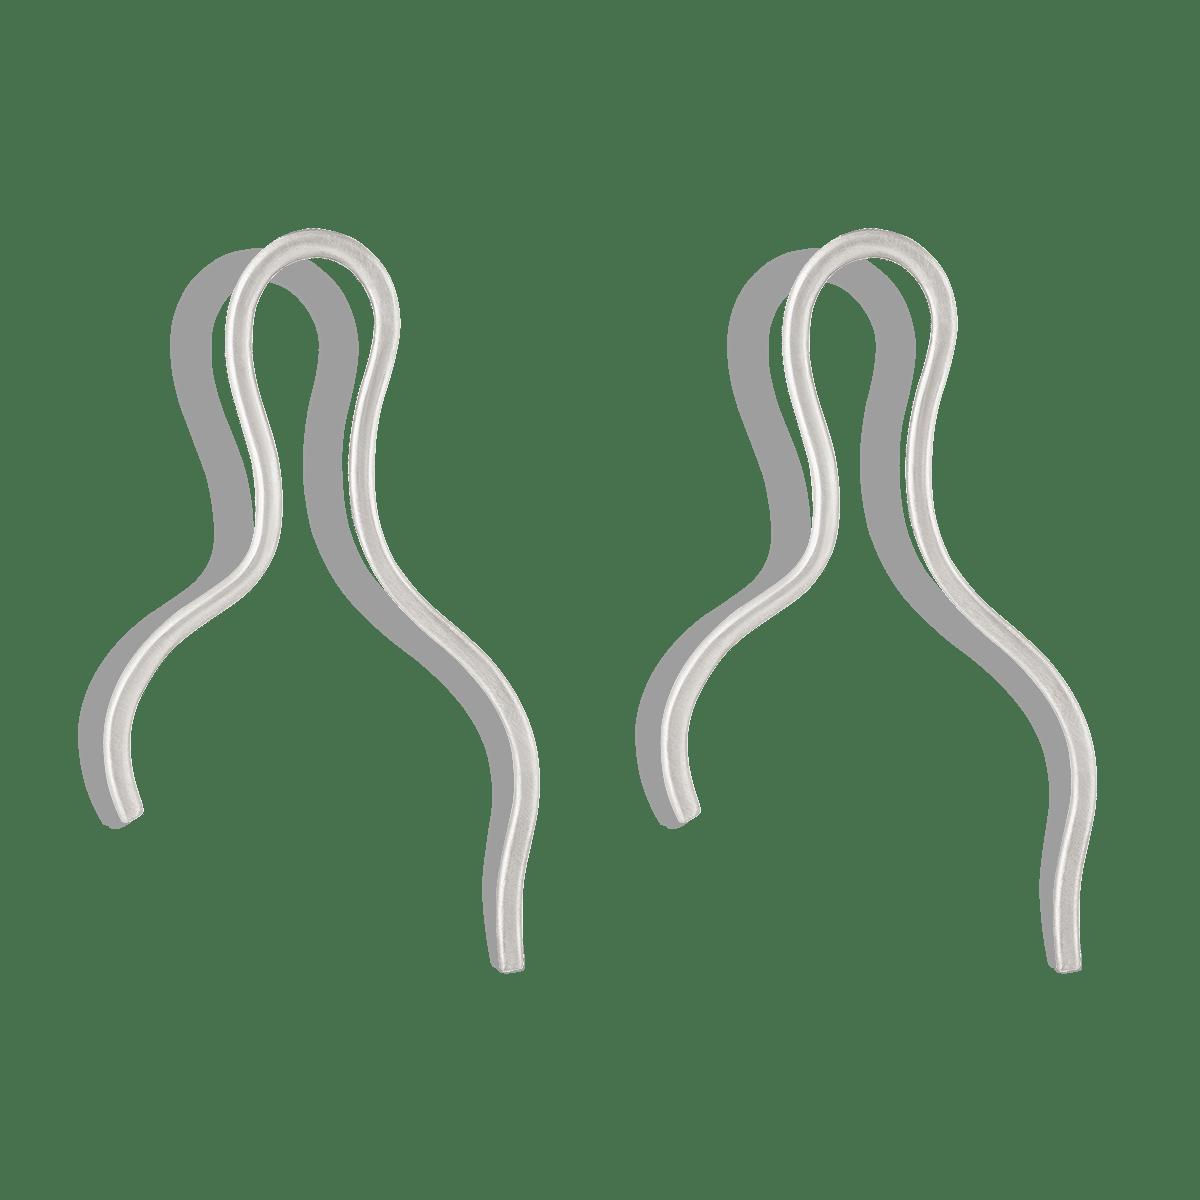 گوشواره نقره سیمپل کرلی Simple Curly